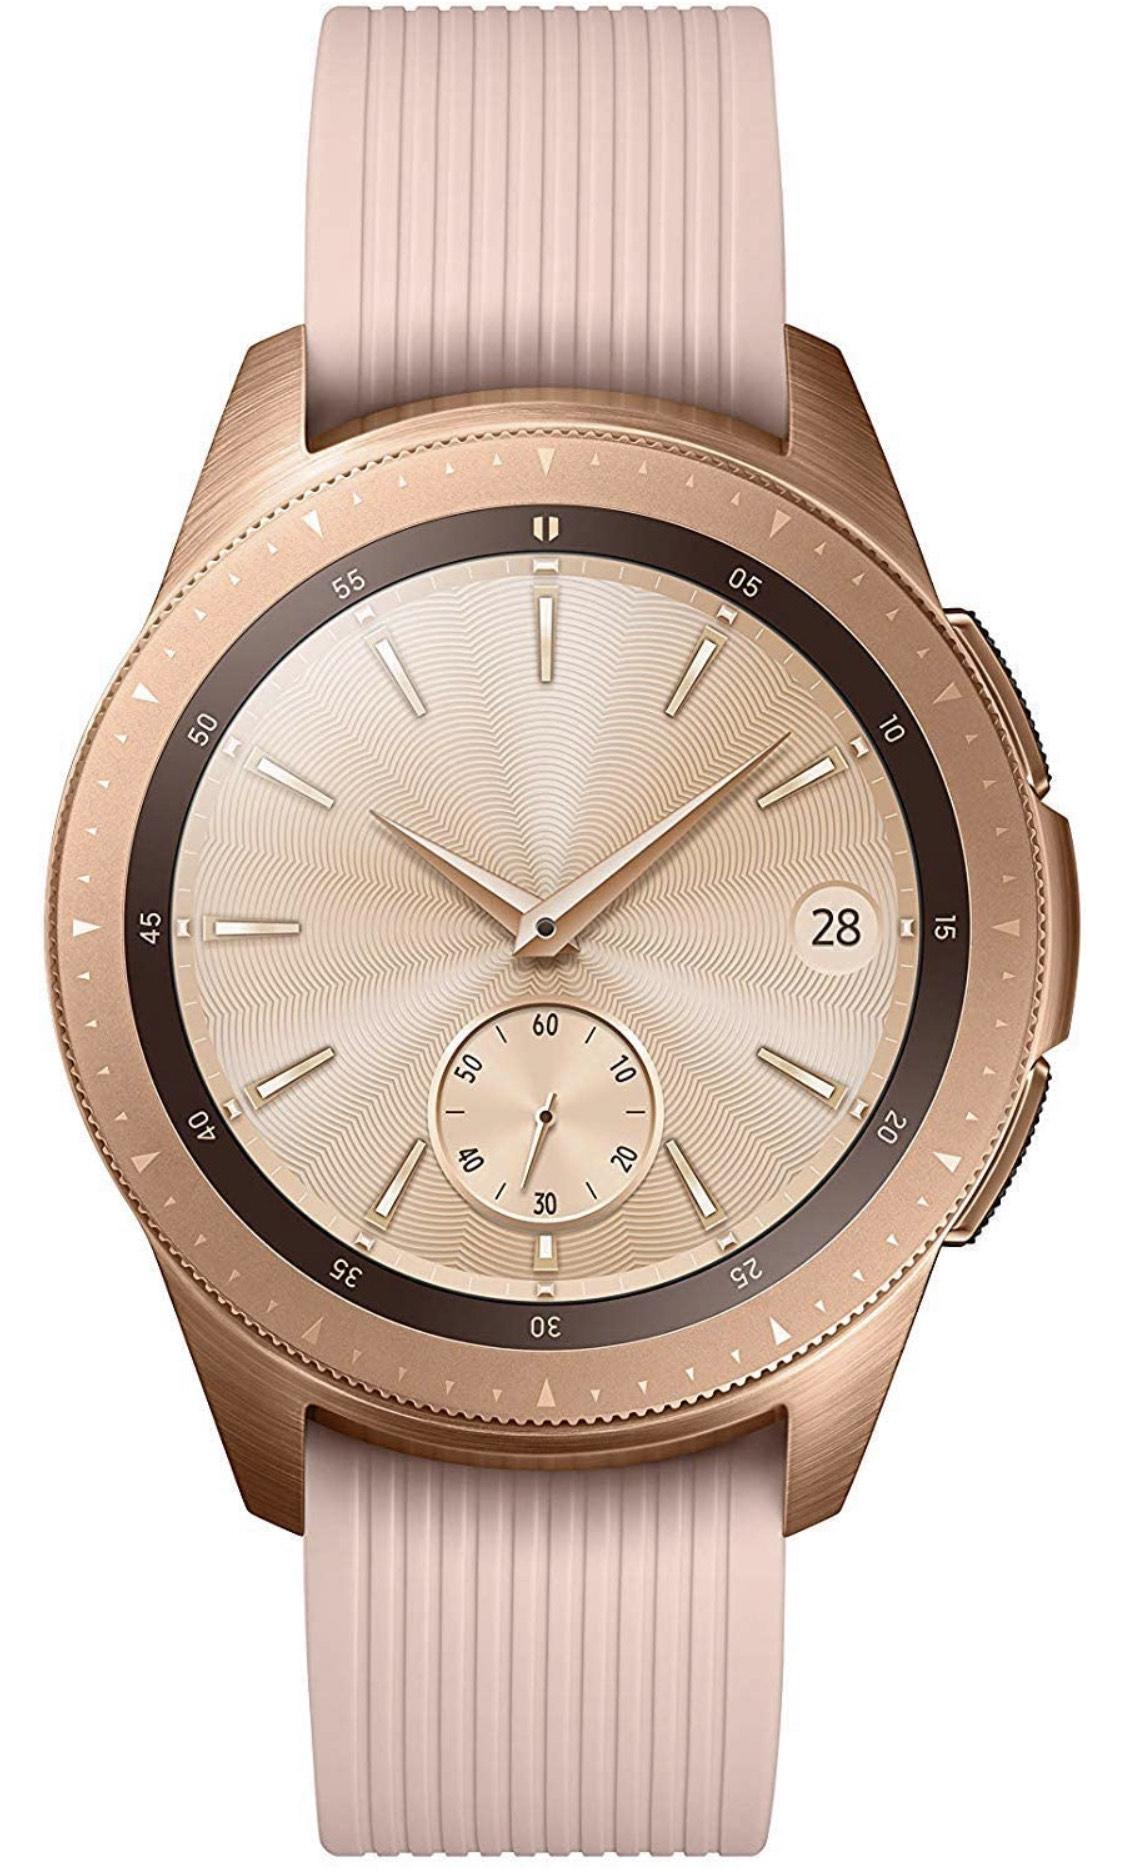 Samsung Galaxy Watch 42 mm (Bluetooth), Rose Gold